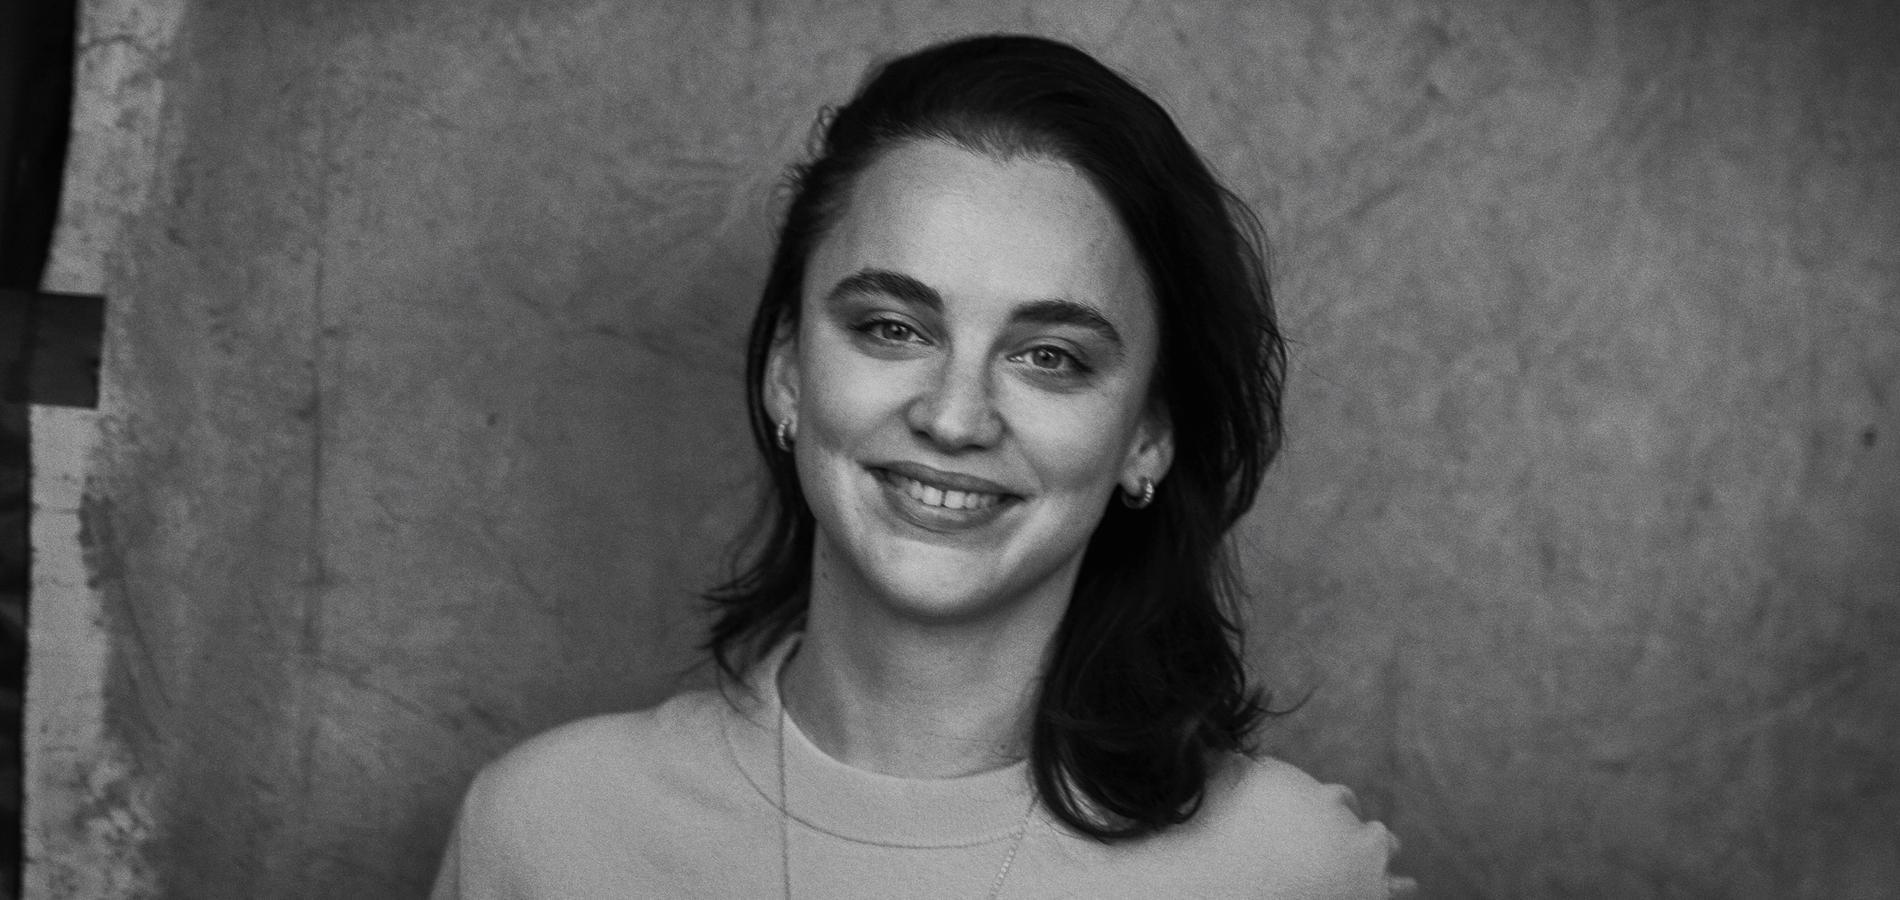 La réalisatrice Anastasia Mikova, juré au Mobile Film Festival 2020